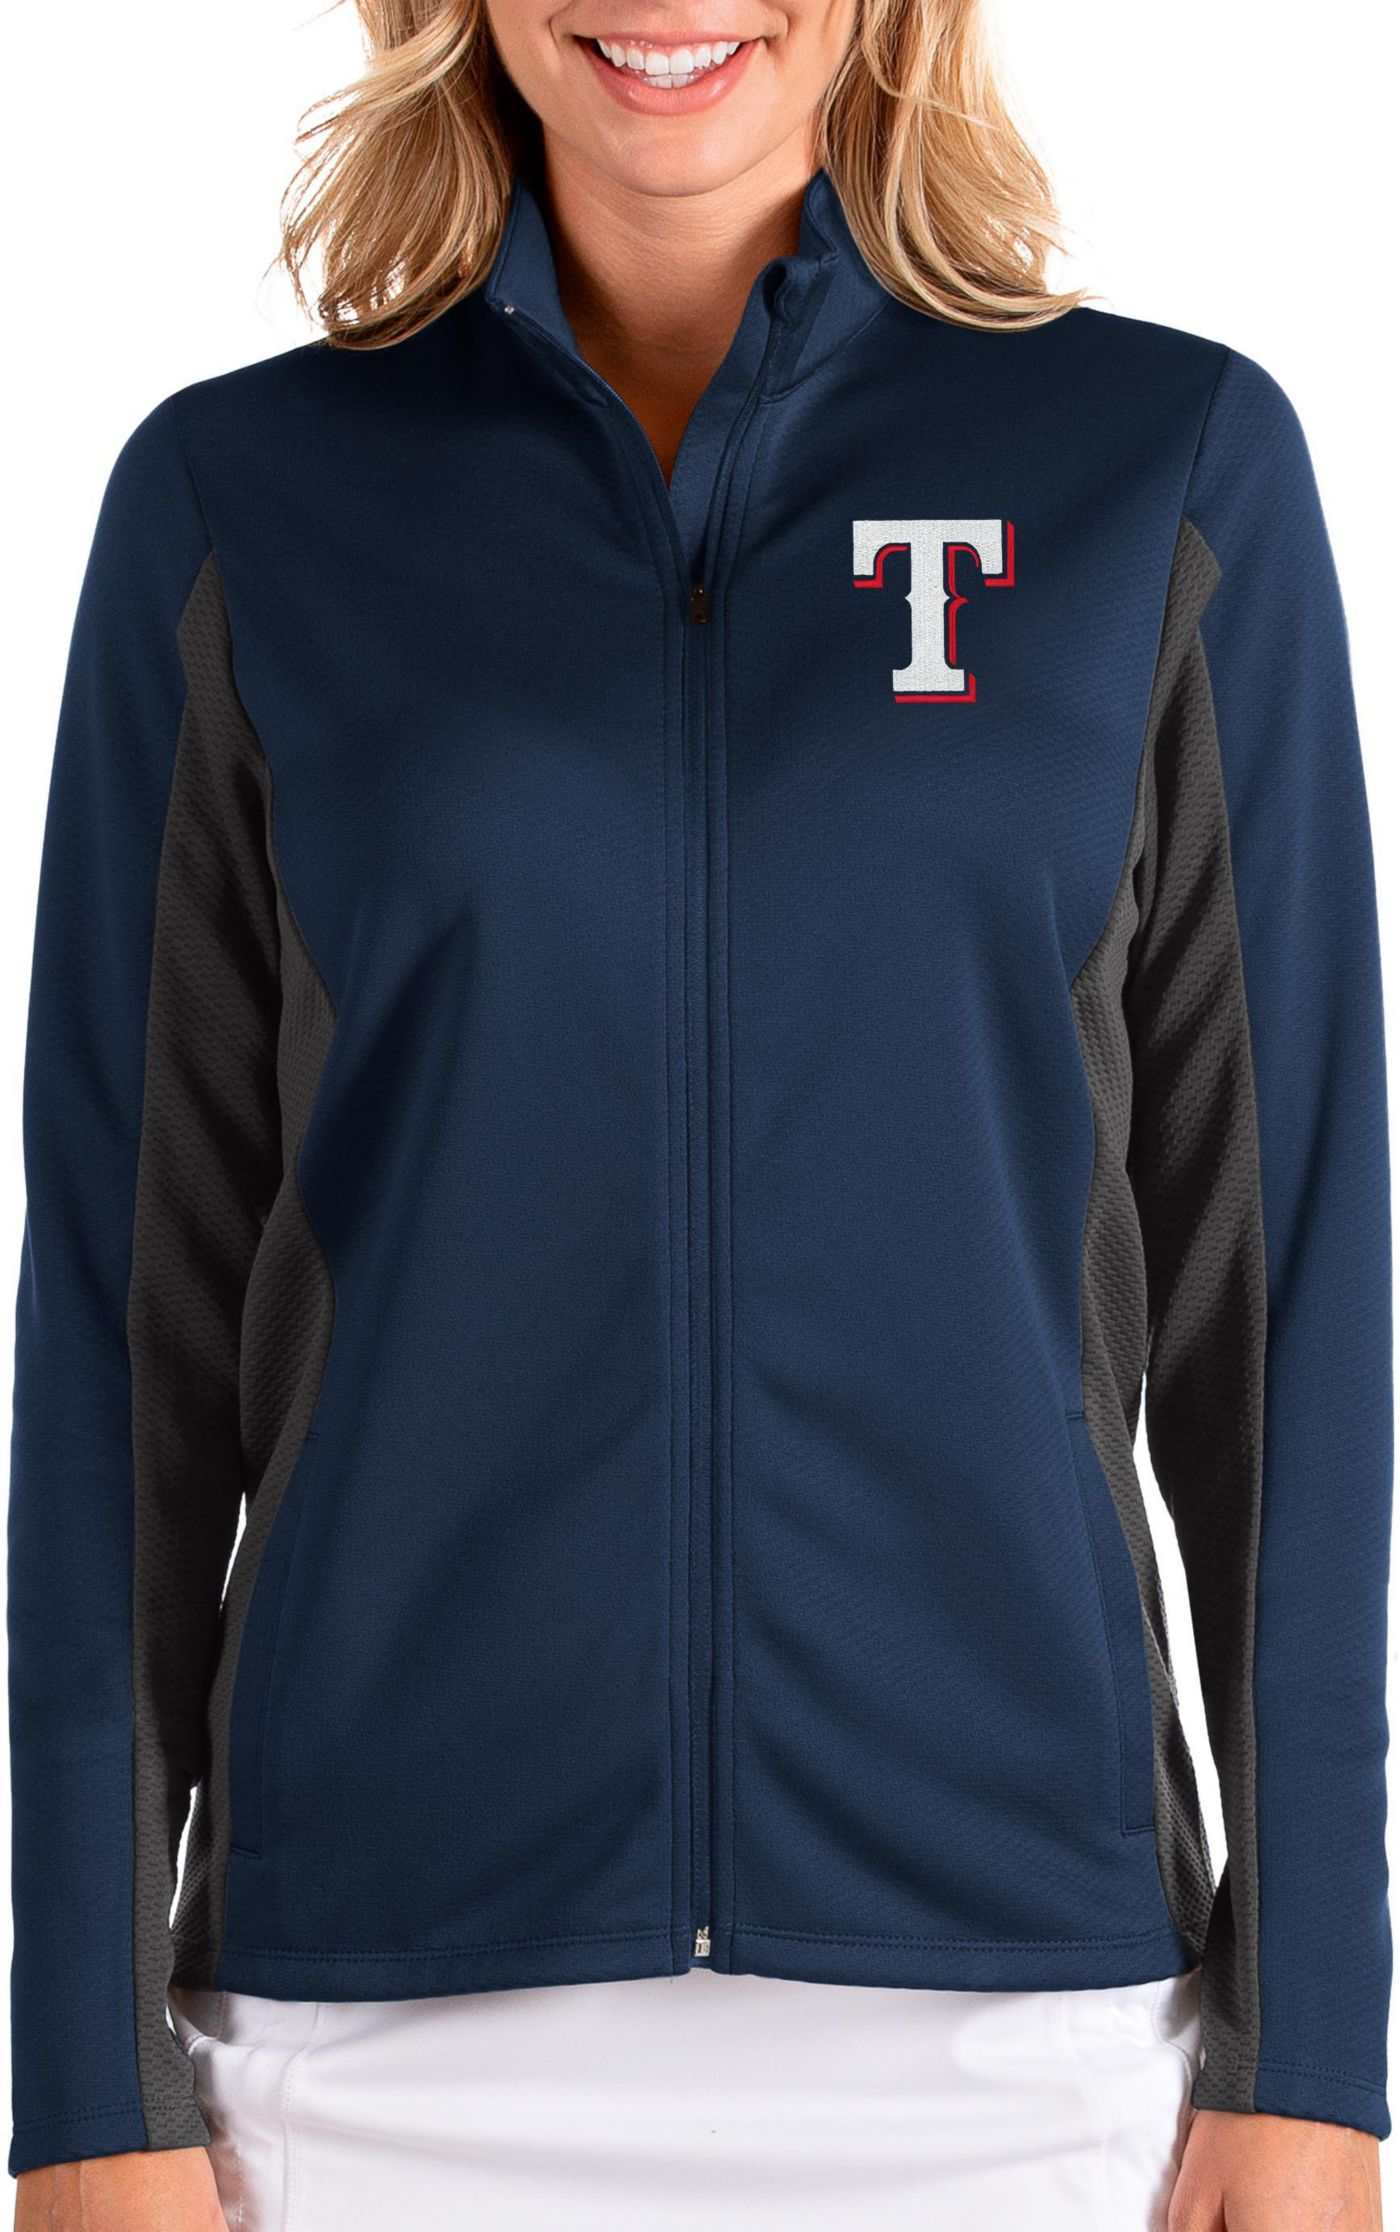 Antigua Women's Texas Rangers Navy Passage Full-Zip Jacket